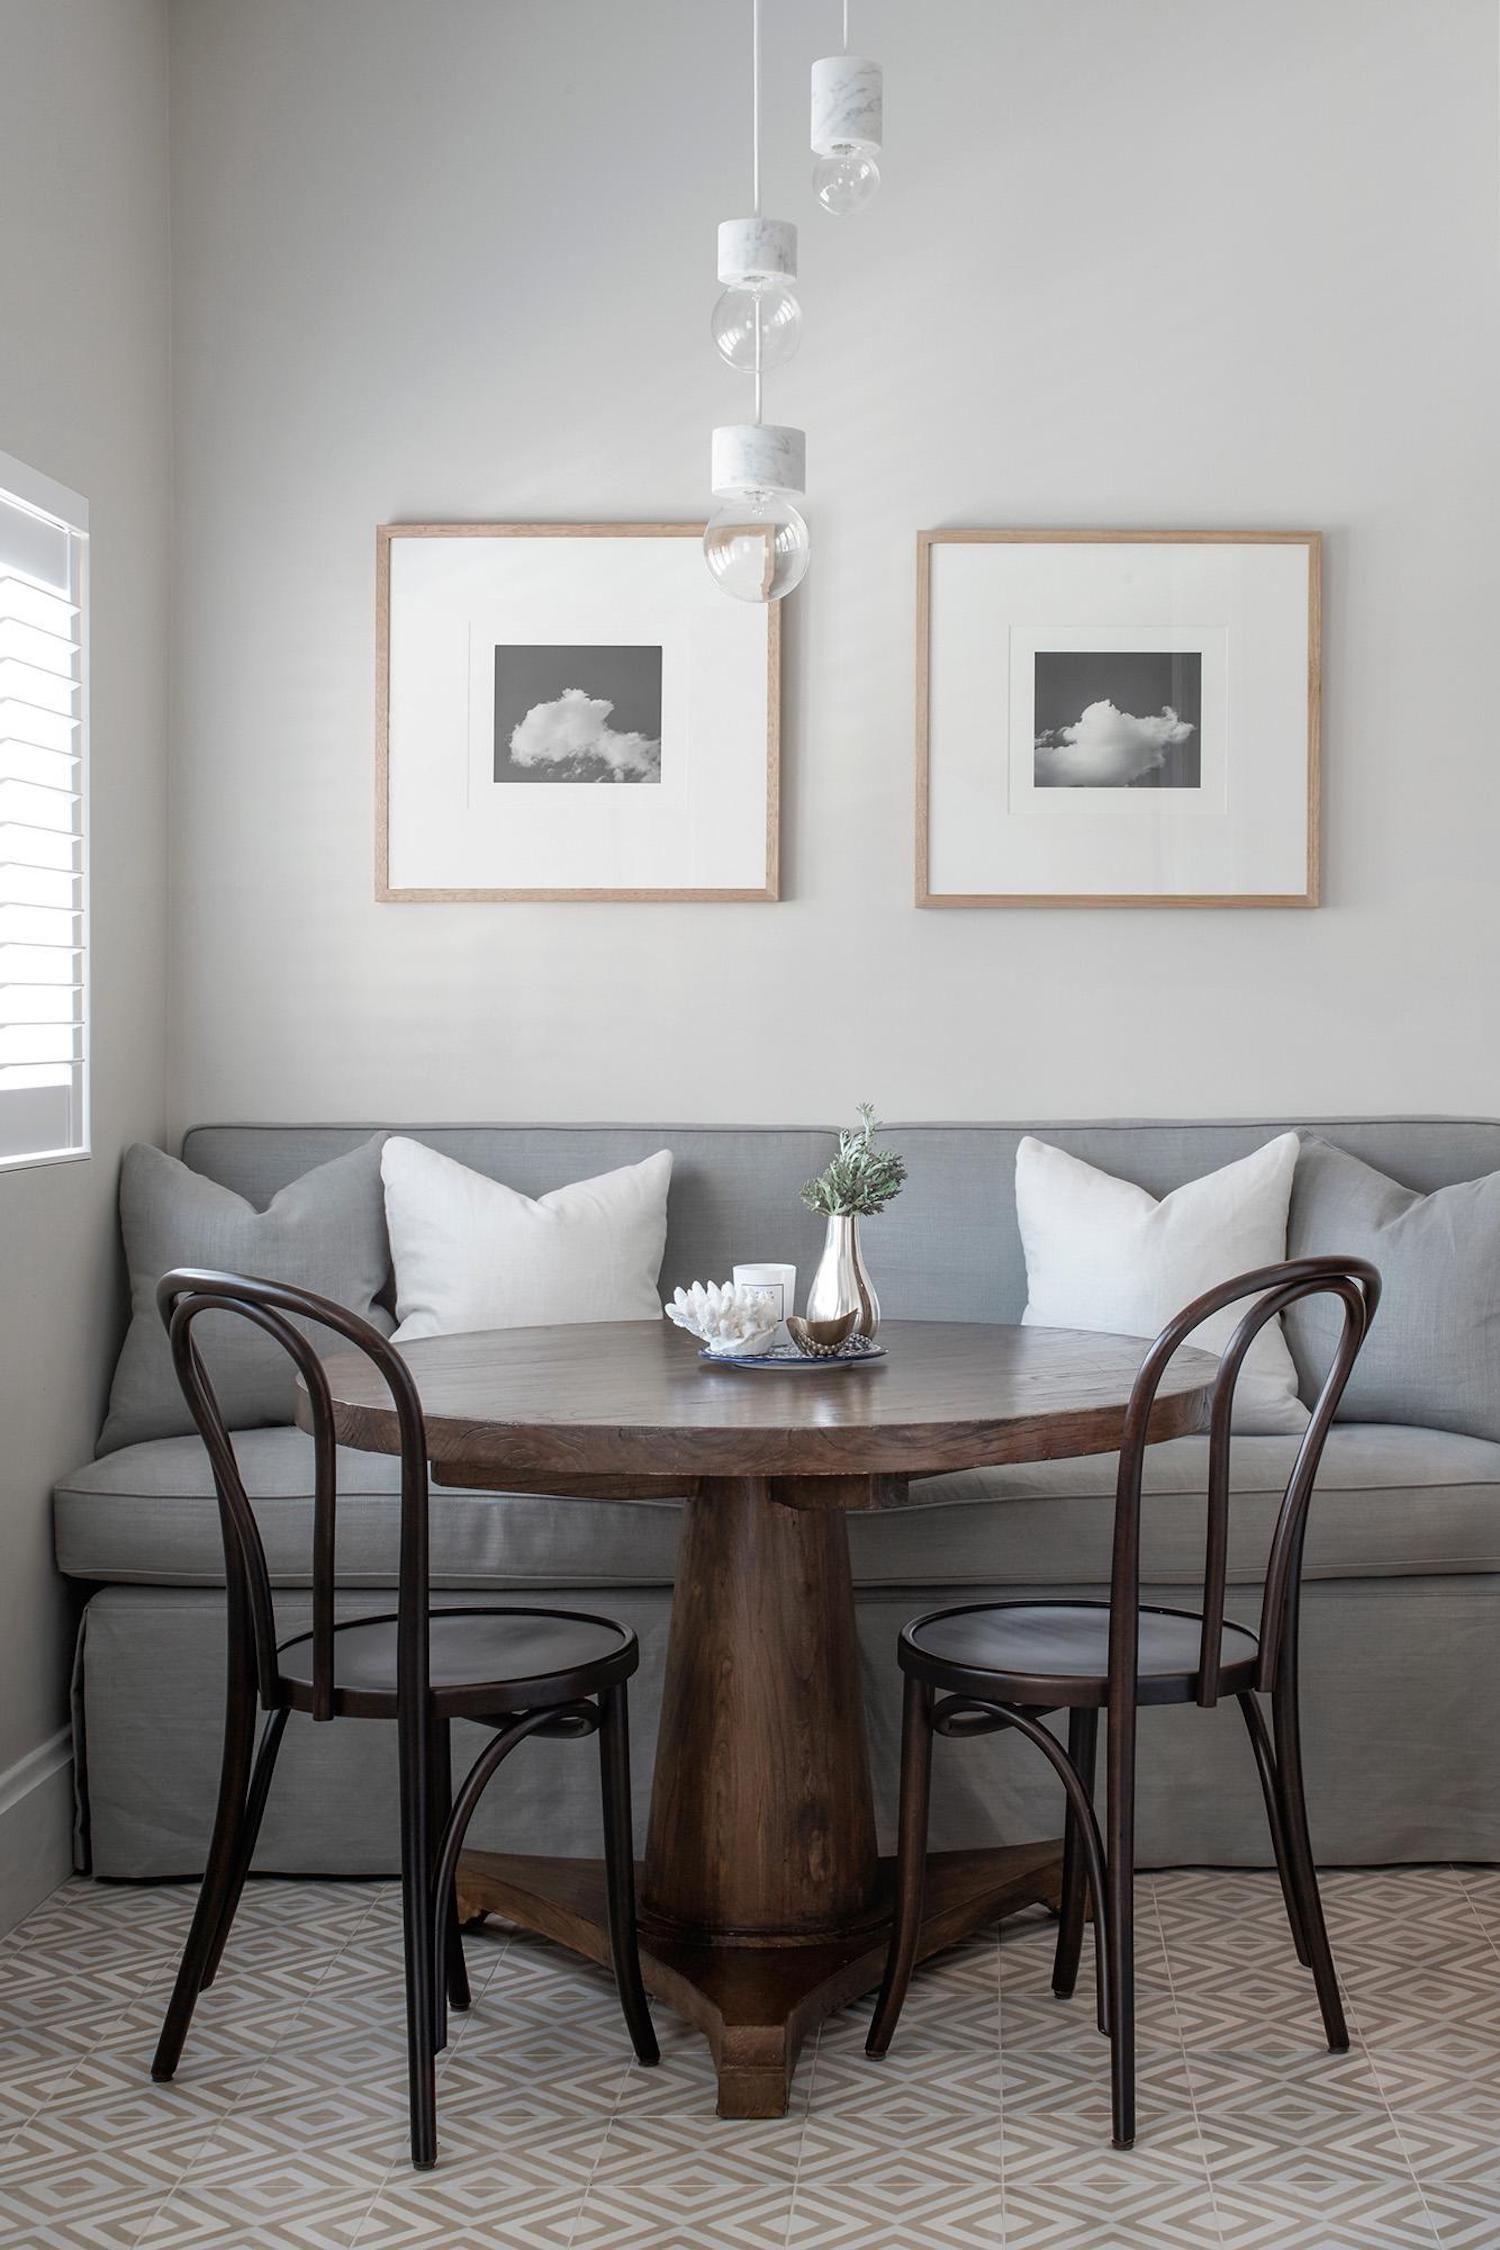 Admirable Breakfast Nooks My Top 10 Favourite Looks Dining Nook Creativecarmelina Interior Chair Design Creativecarmelinacom